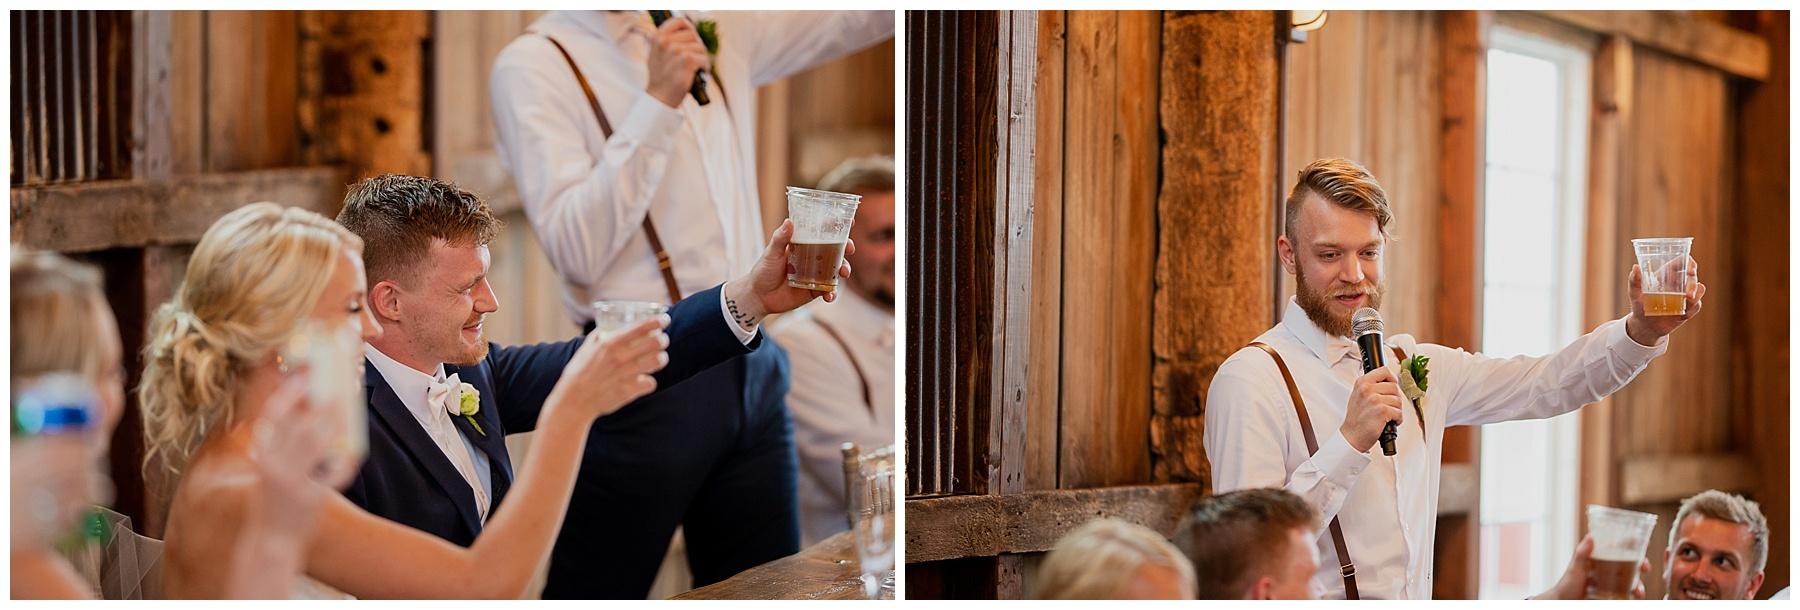 WISCONSIN WEDDING PHOTOGRAPHER 165.jpg